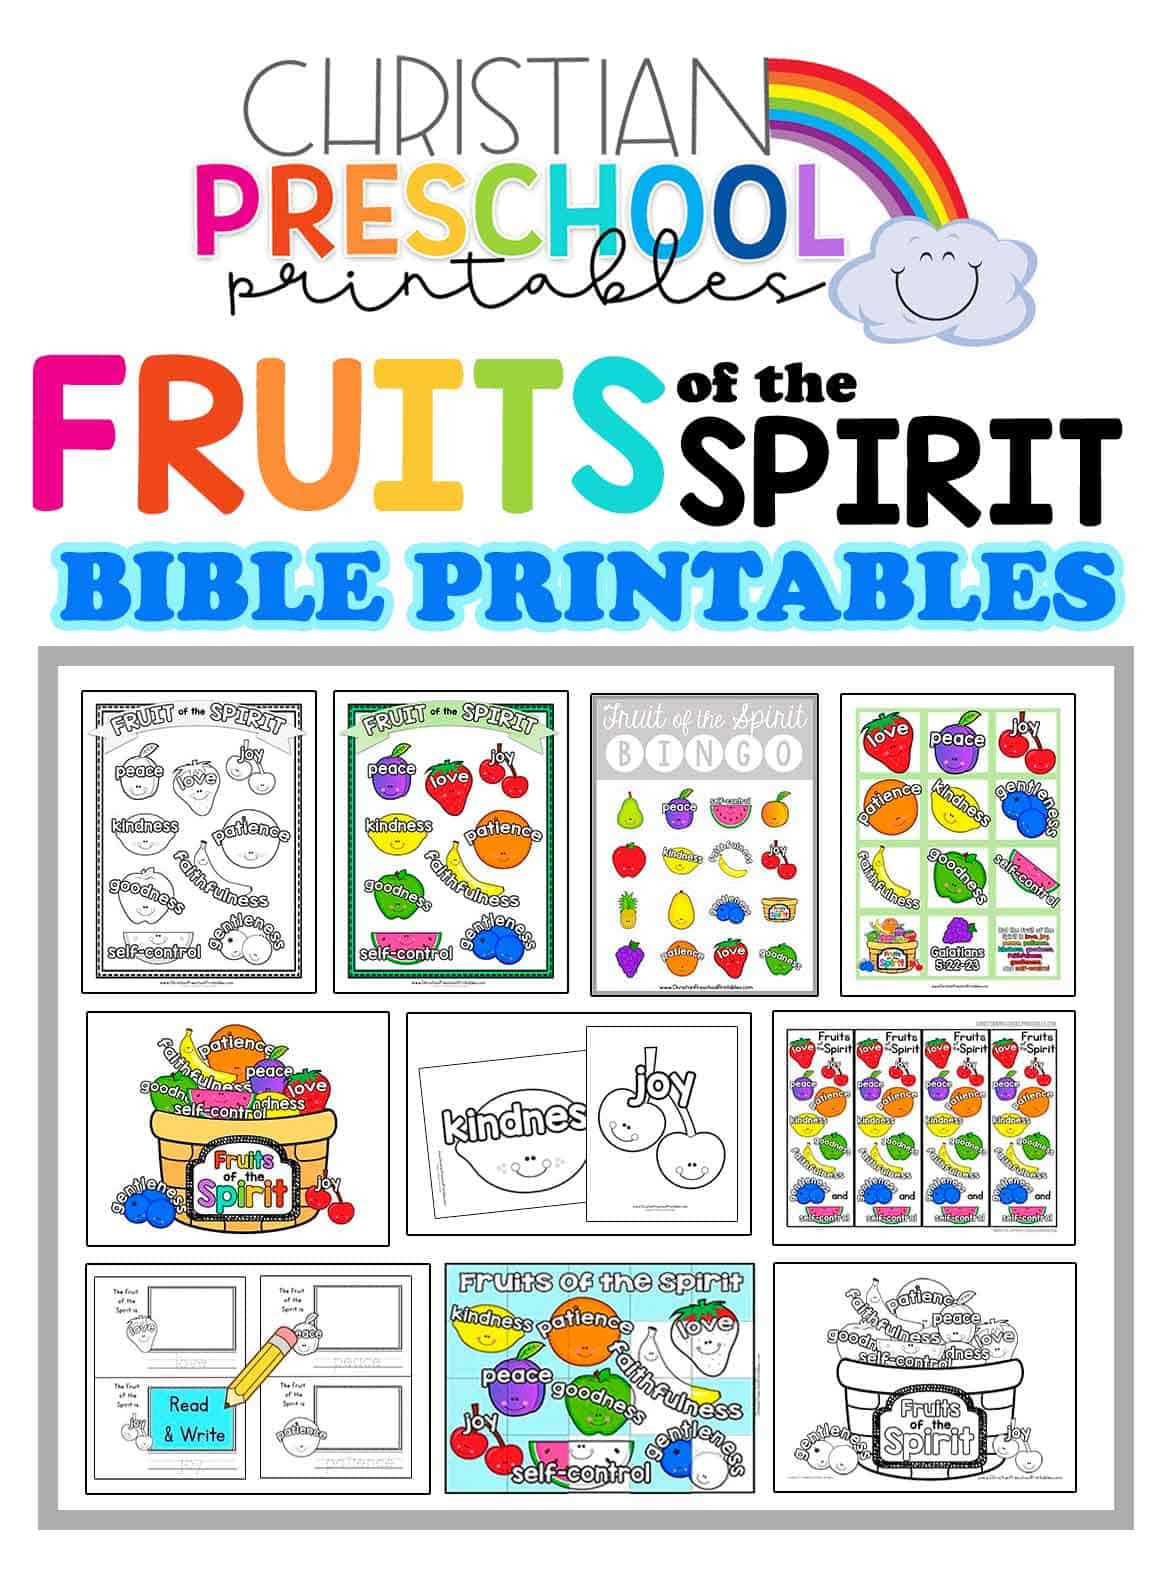 Fruits Of the Spirit Worksheet Fruit Of the Spirit Printables Christian Preschool Printables